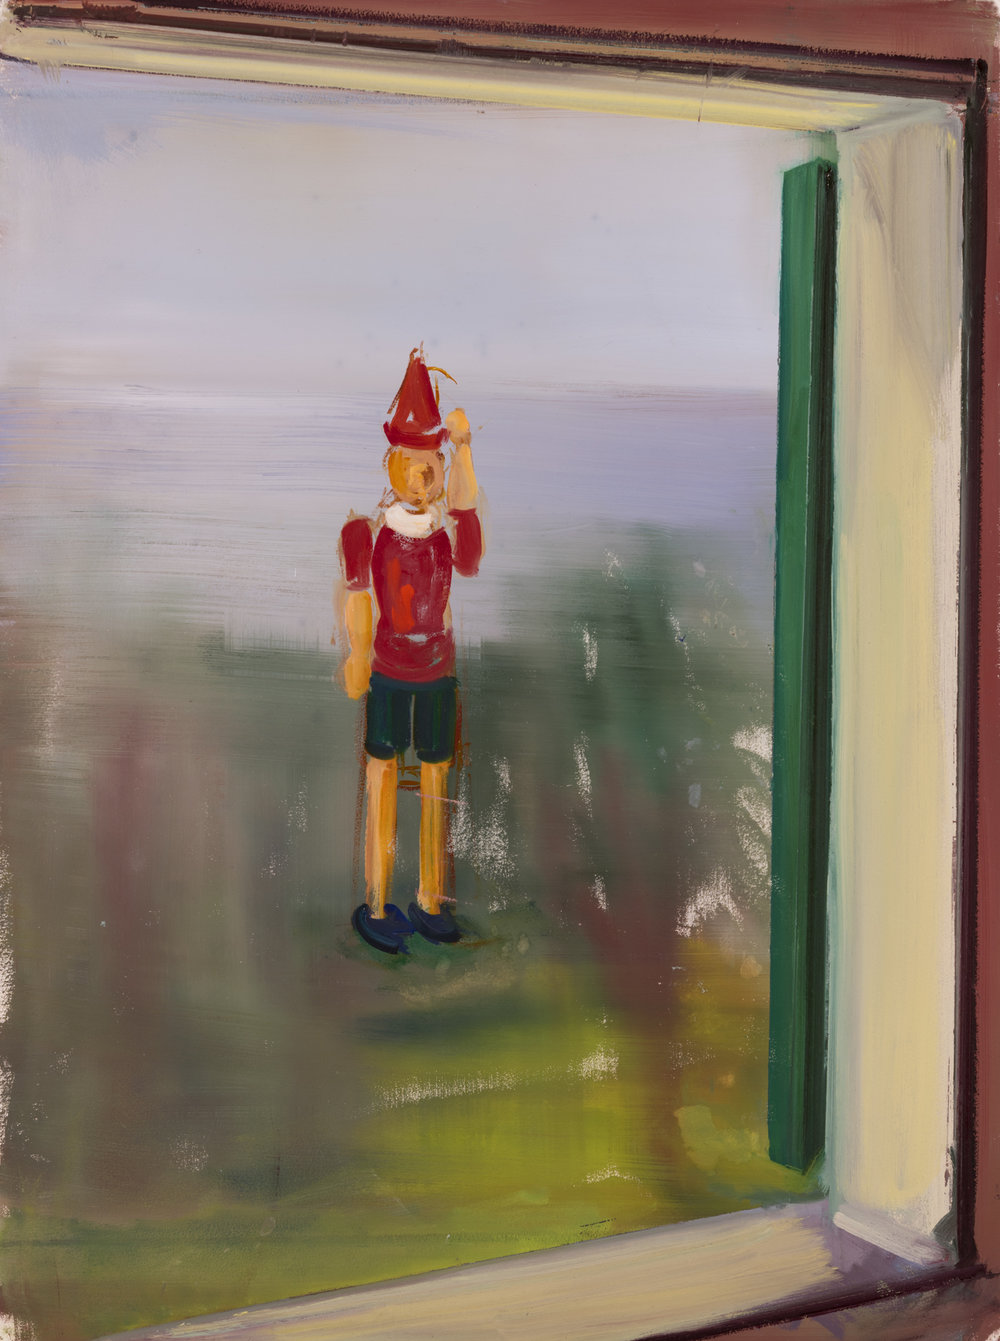 Pinocchio Waving, 2016